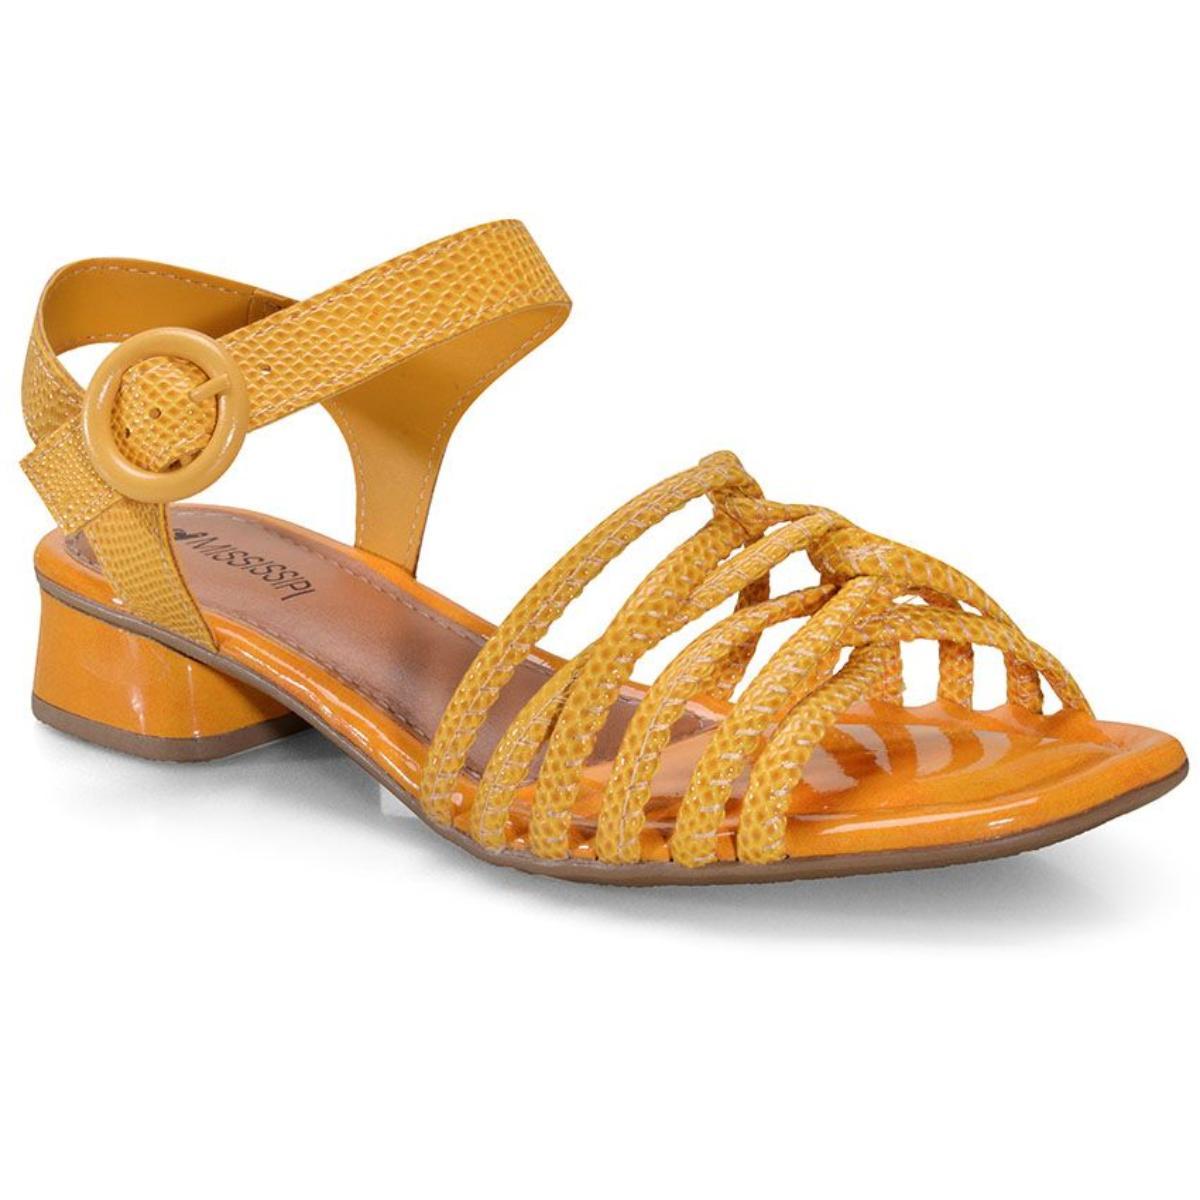 Sandália Feminina Mississipi Q3752 Amarelo